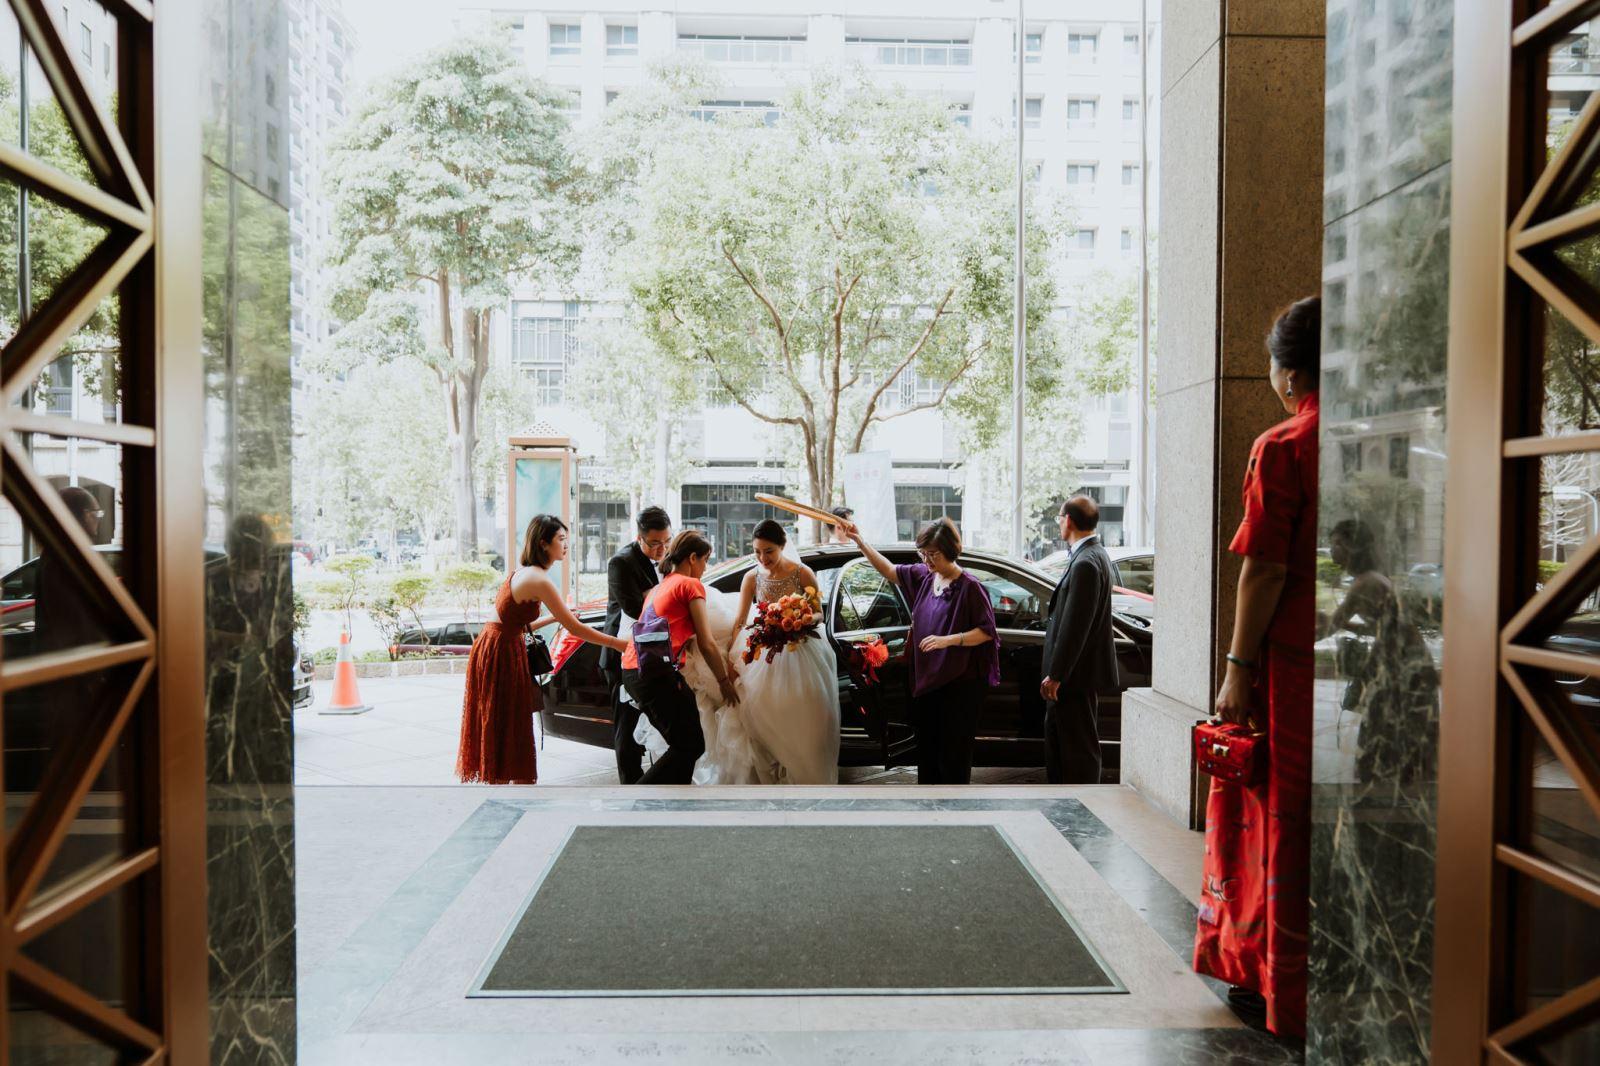 TWO in ONE婚禮顧問團隊服務新娘下車,米篩天遮天,天最大